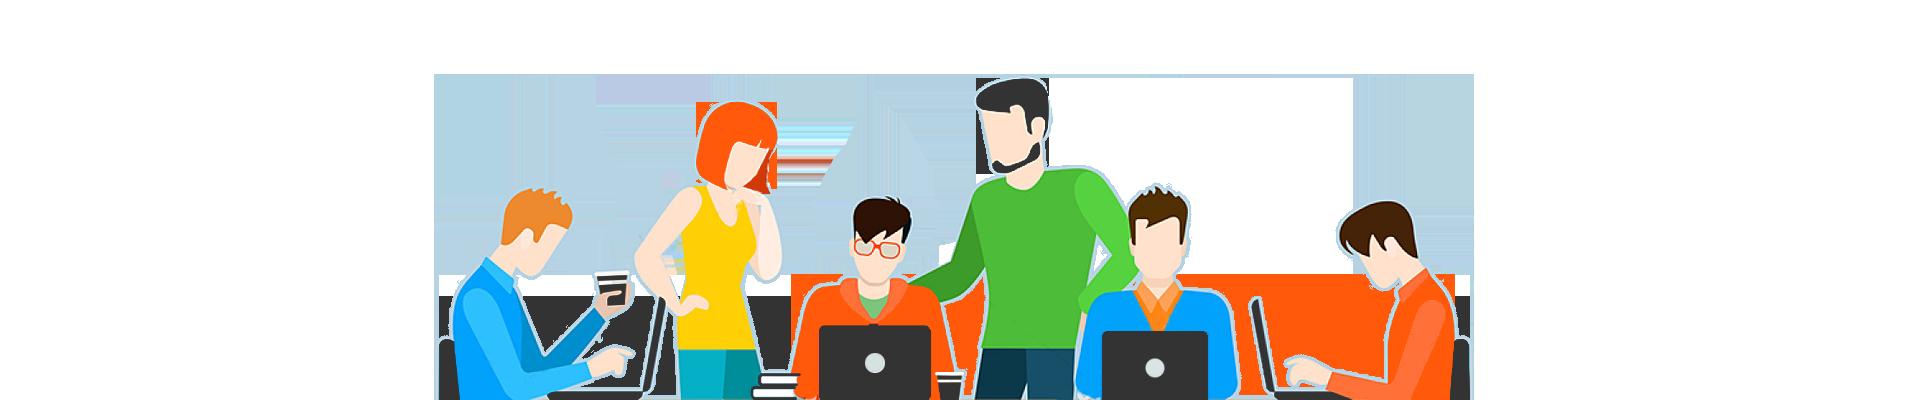 web-agency-team-work